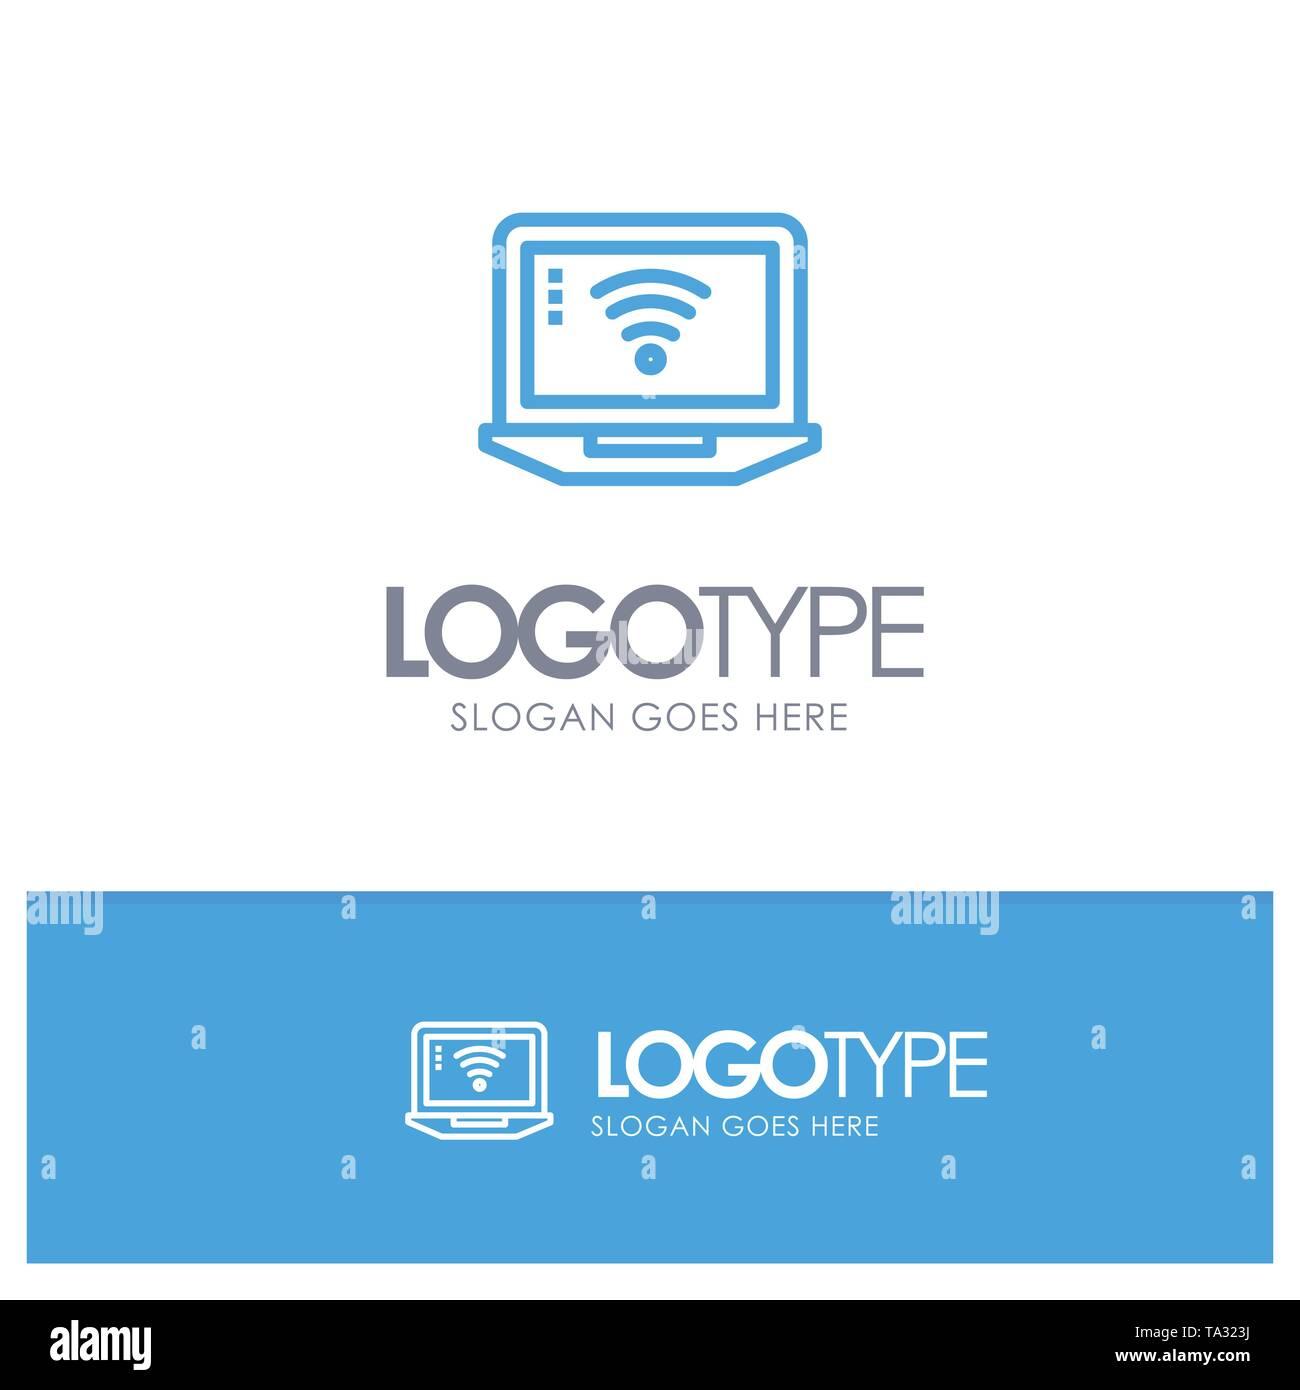 Laptop, Computer, Signal, Wifi Blue Logo Line Style - Stock Image